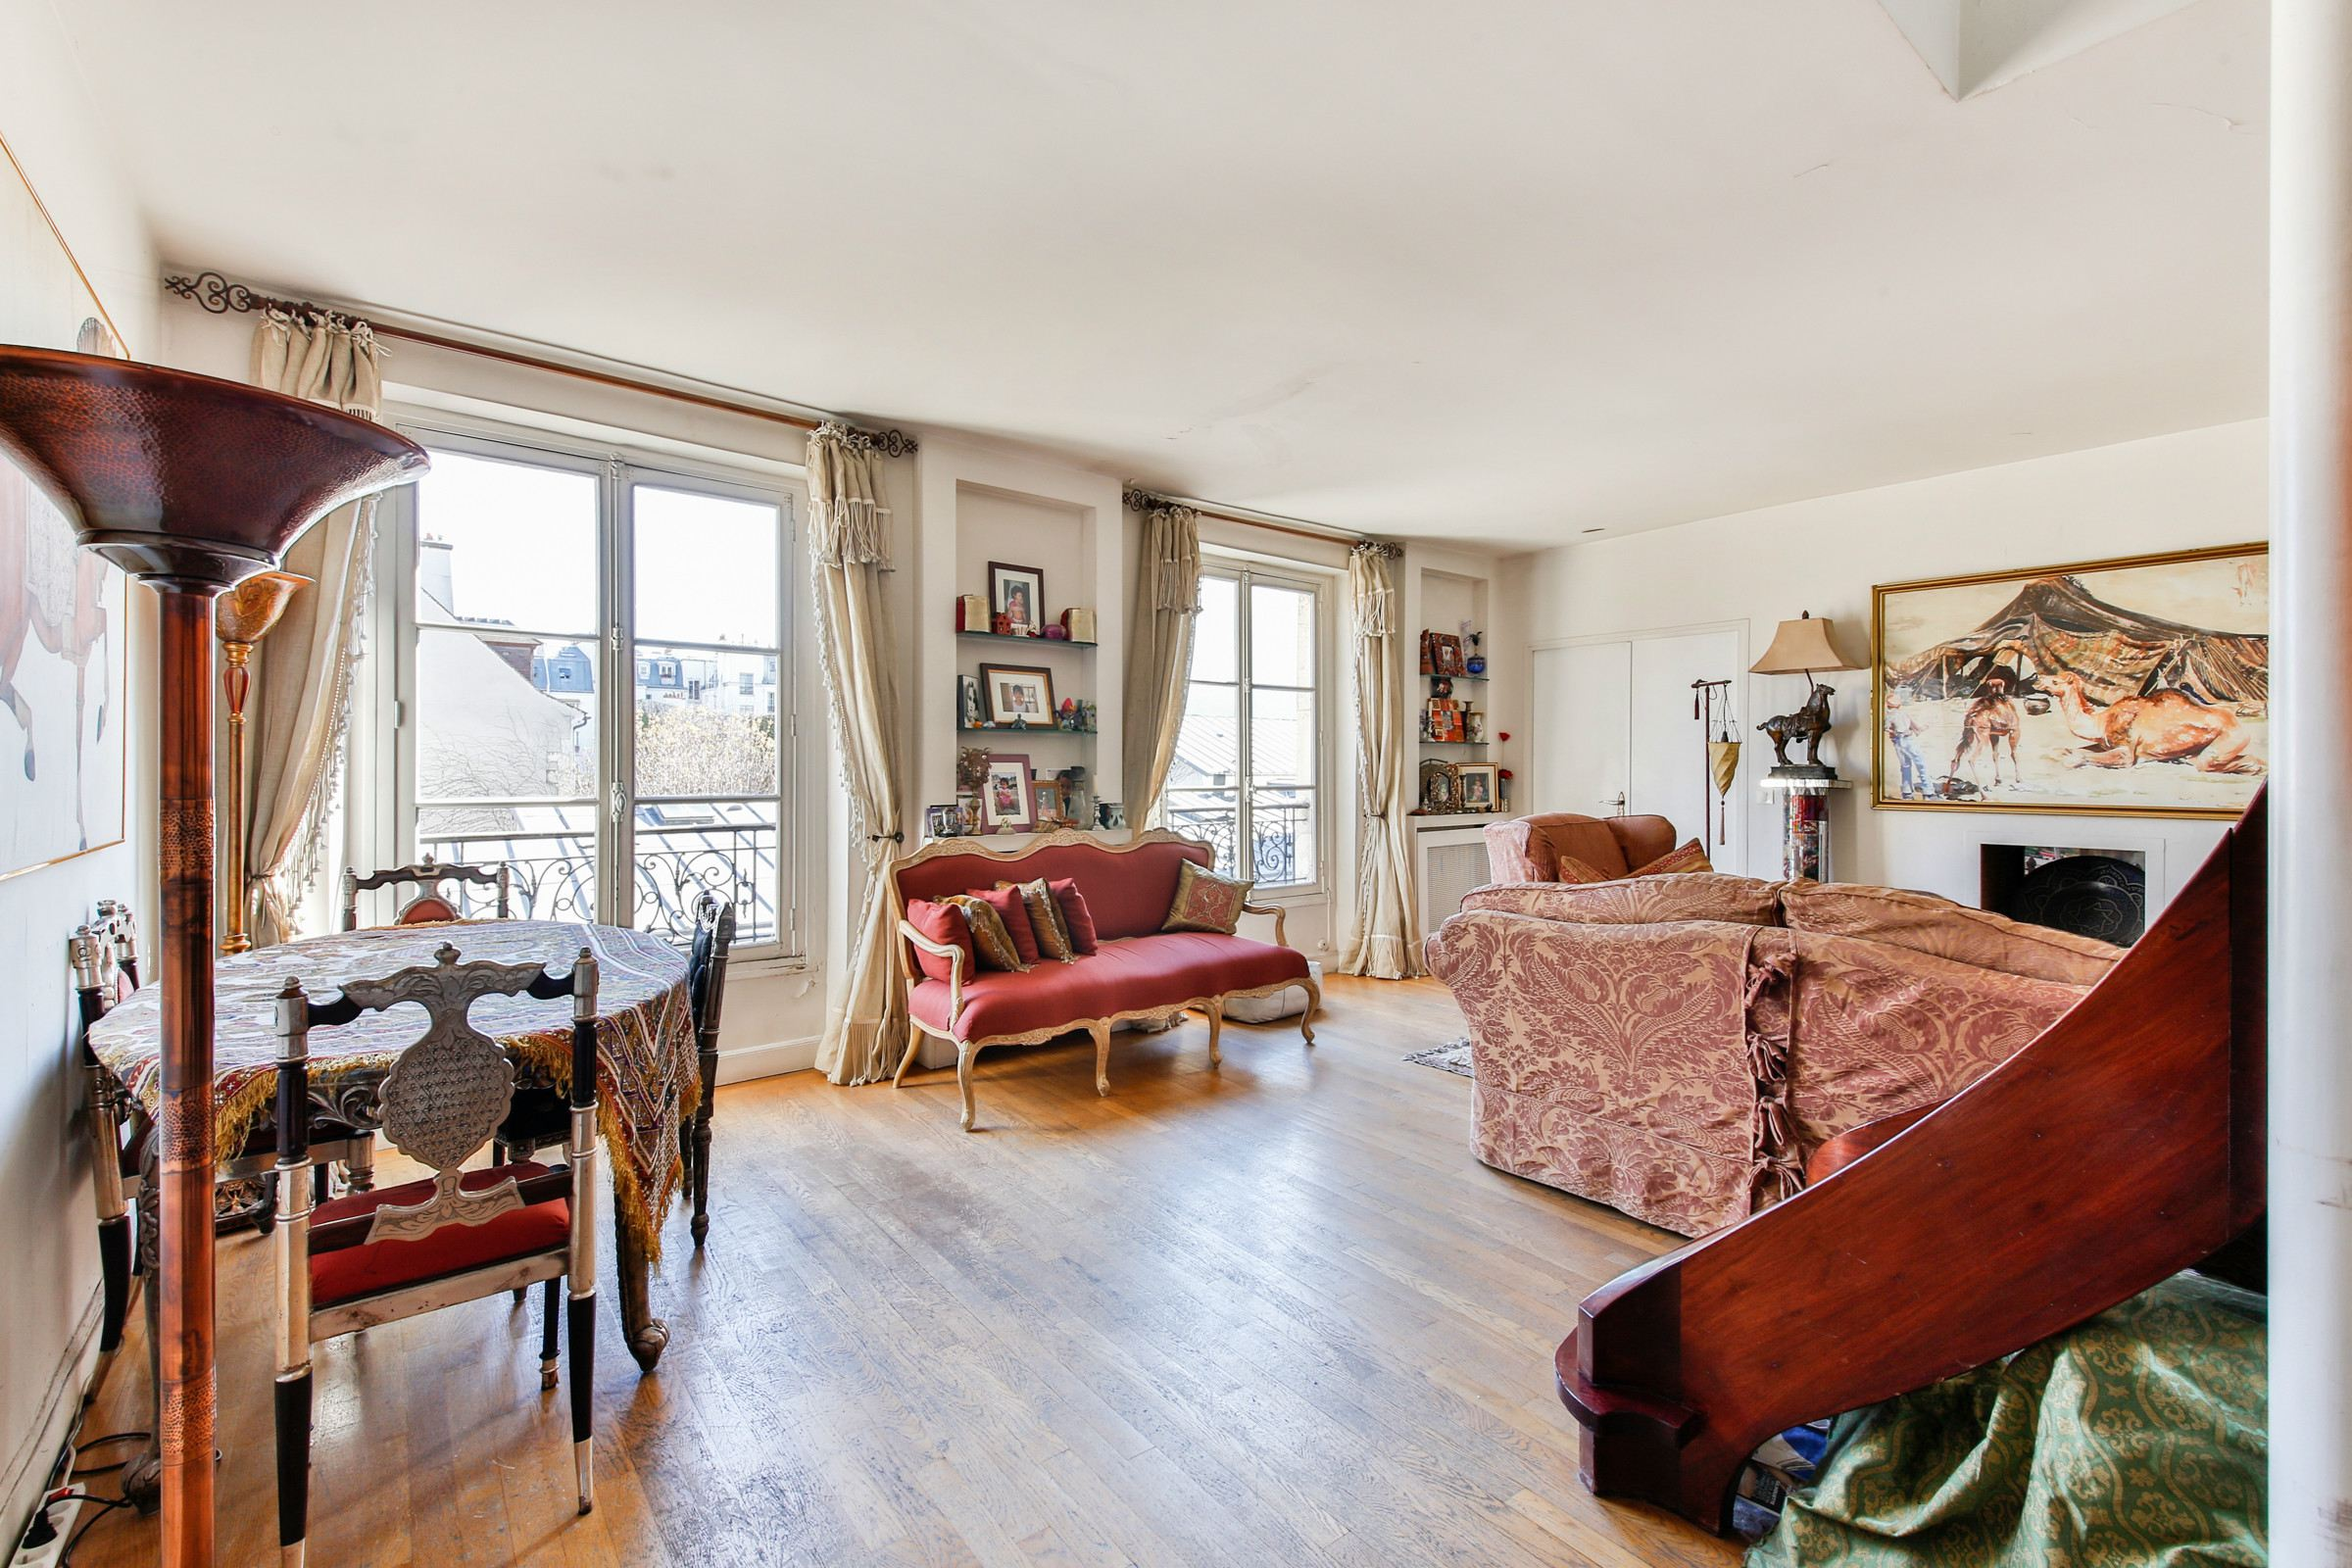 sales property at Paris 3 - Marais. Duplex. Sunny.